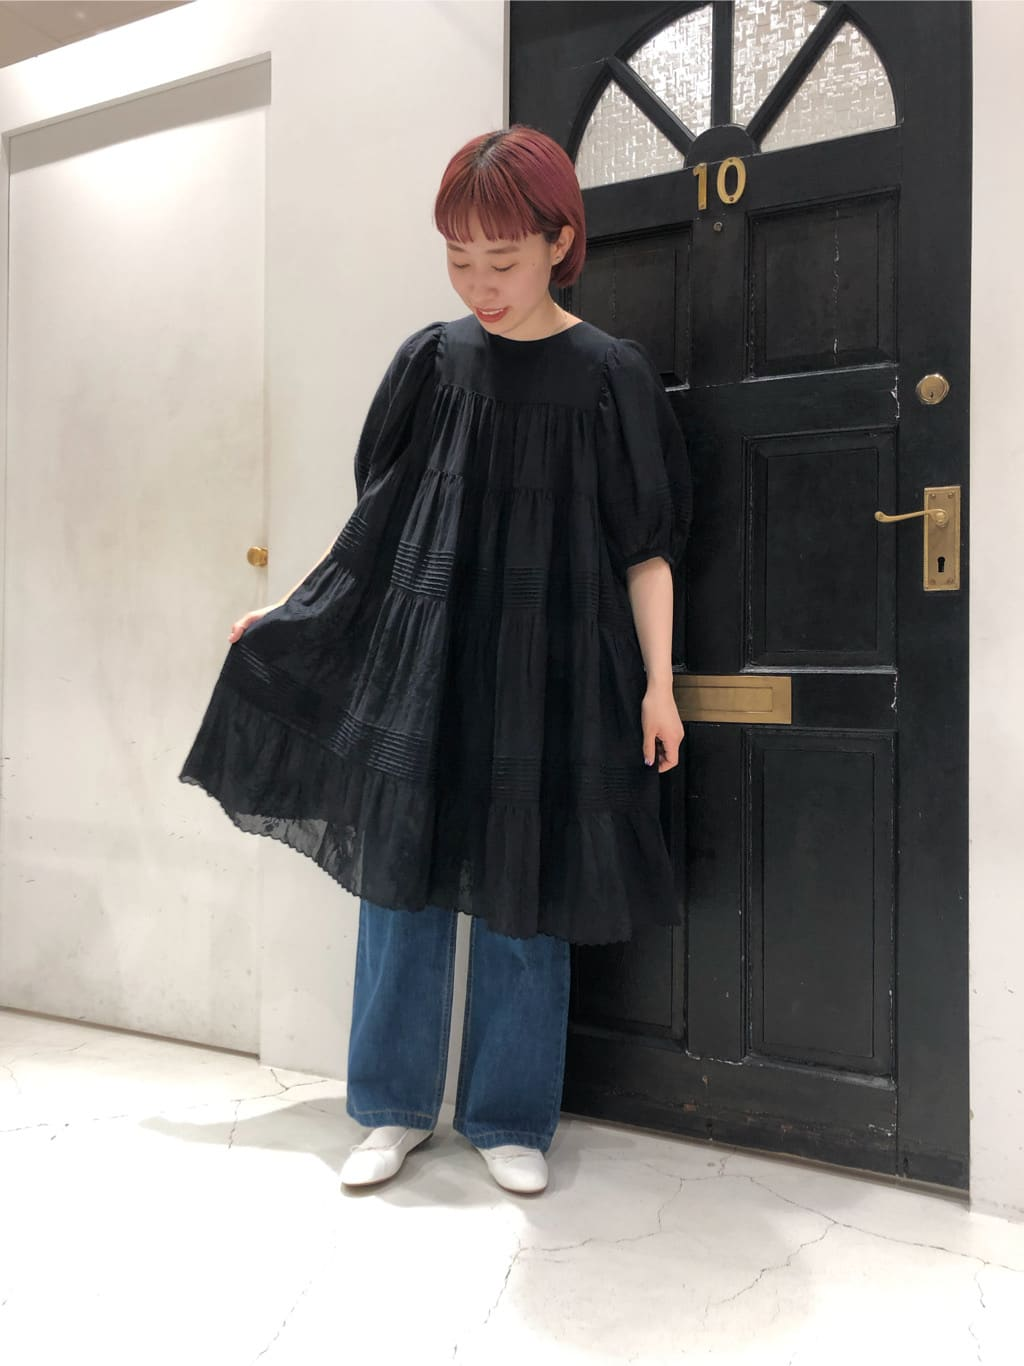 Dot and Stripes CHILD WOMAN ルクアイーレ 身長:157cm 2021.07.09